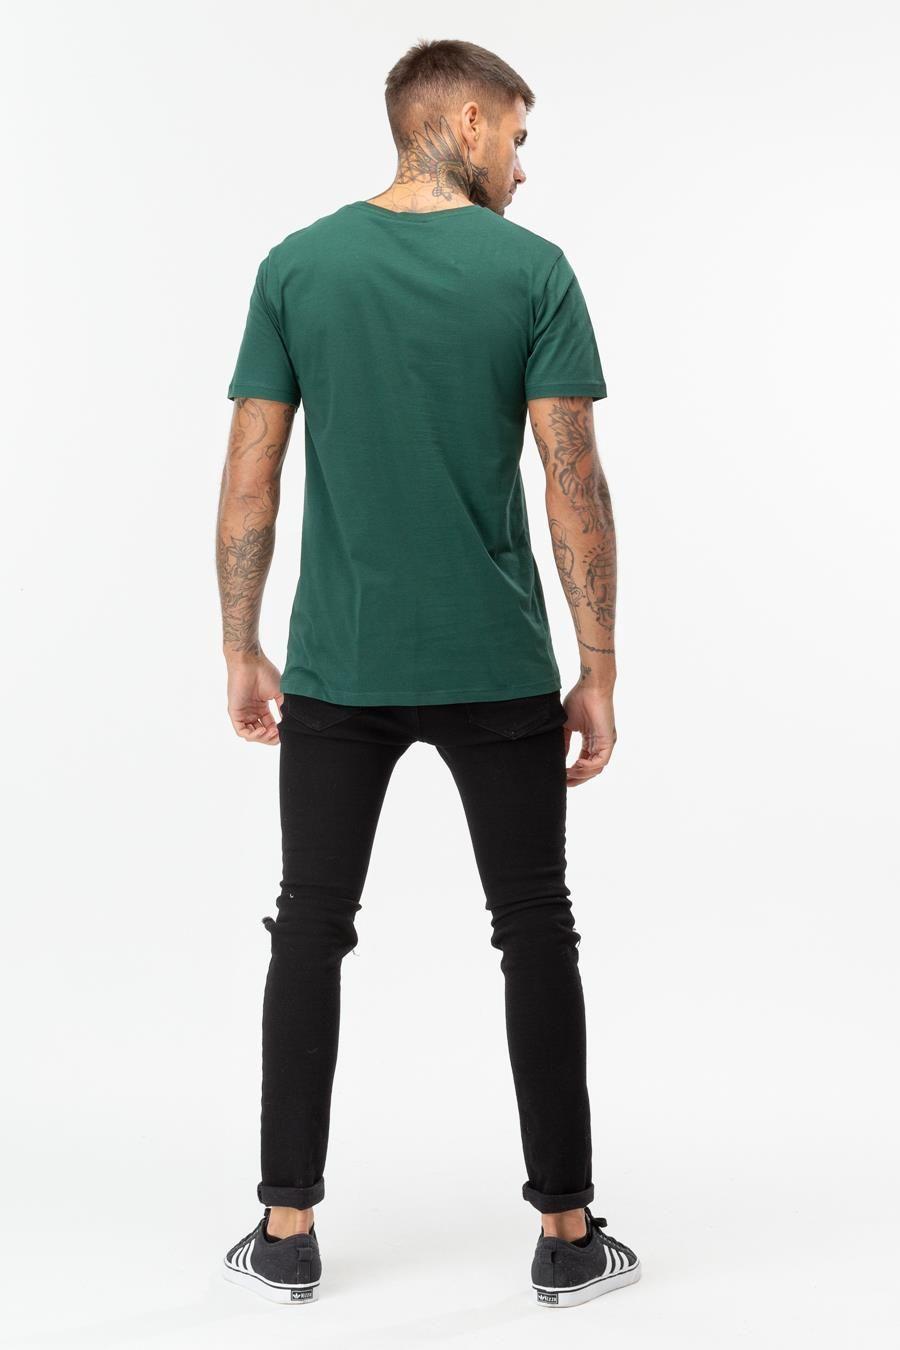 Hype Forest Burgundy Script Mens T-Shirt